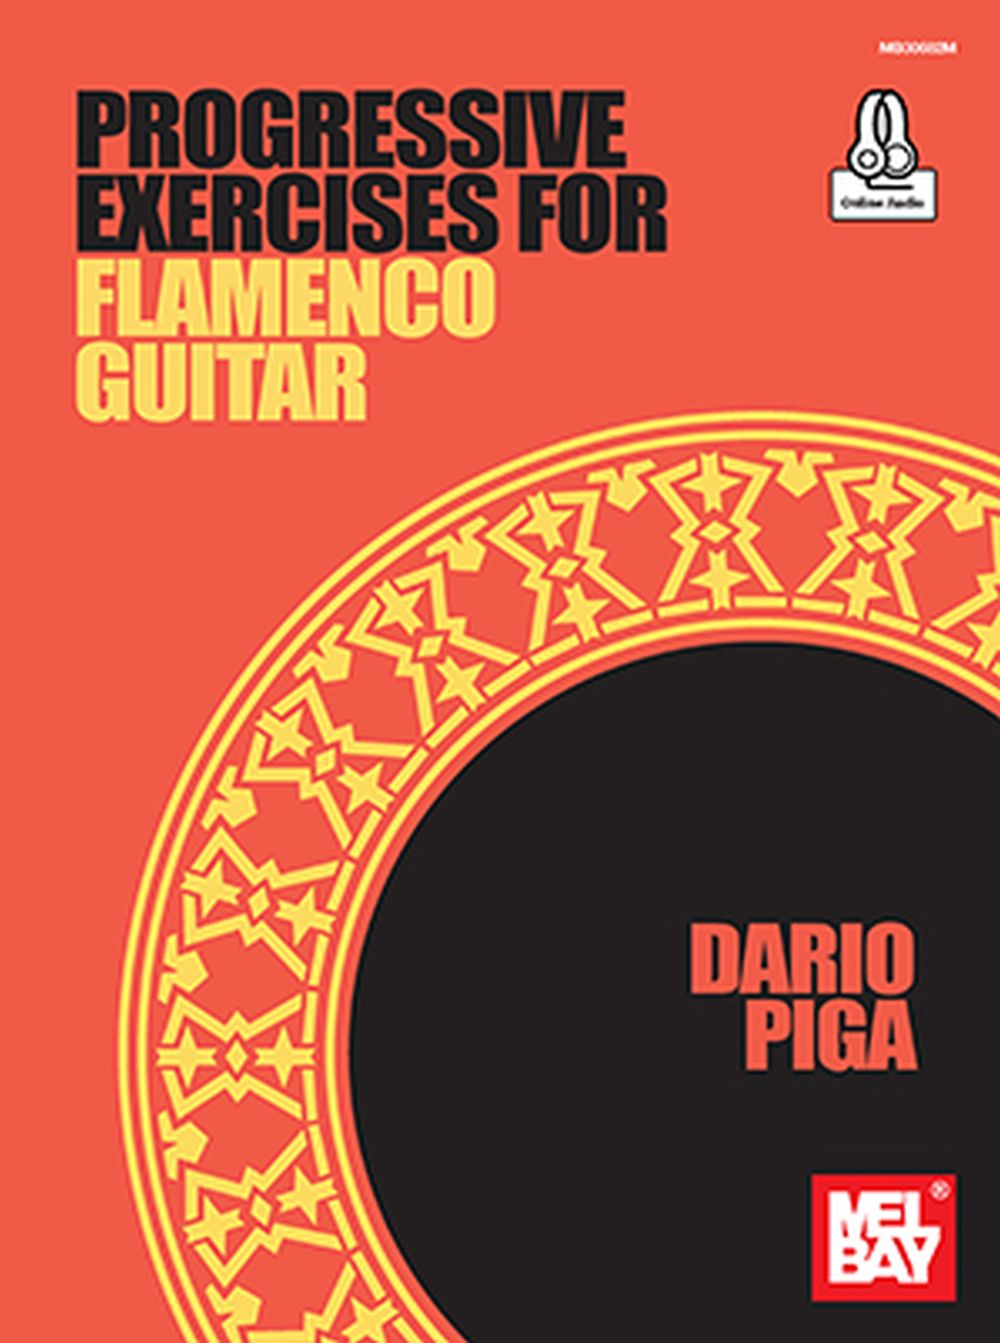 Progressive Exercises For Flamenco Guitar